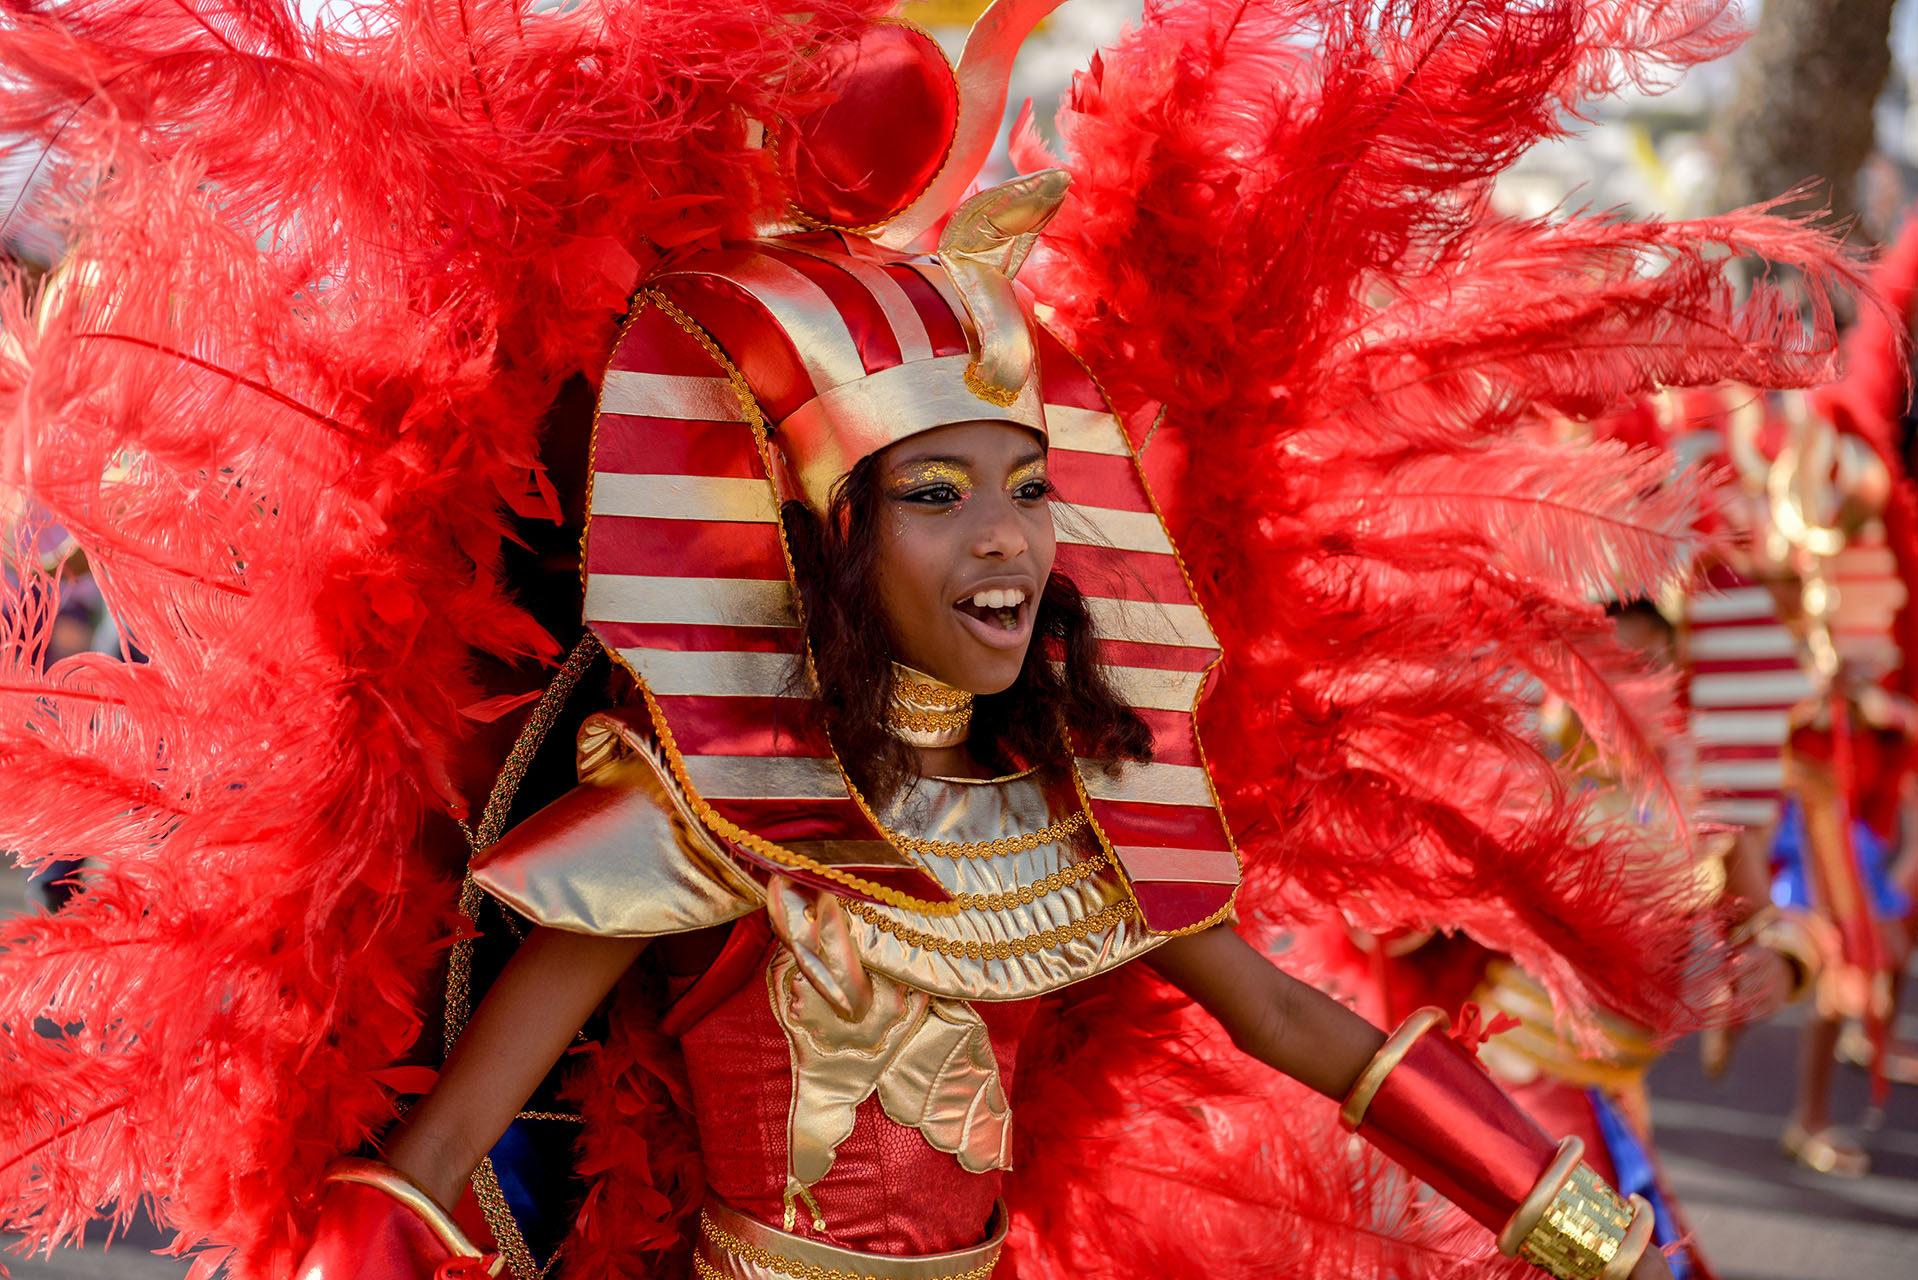 photographe-maya-angelsen-evenementiel-voyage-ile-de-france-carnaval-mindelo